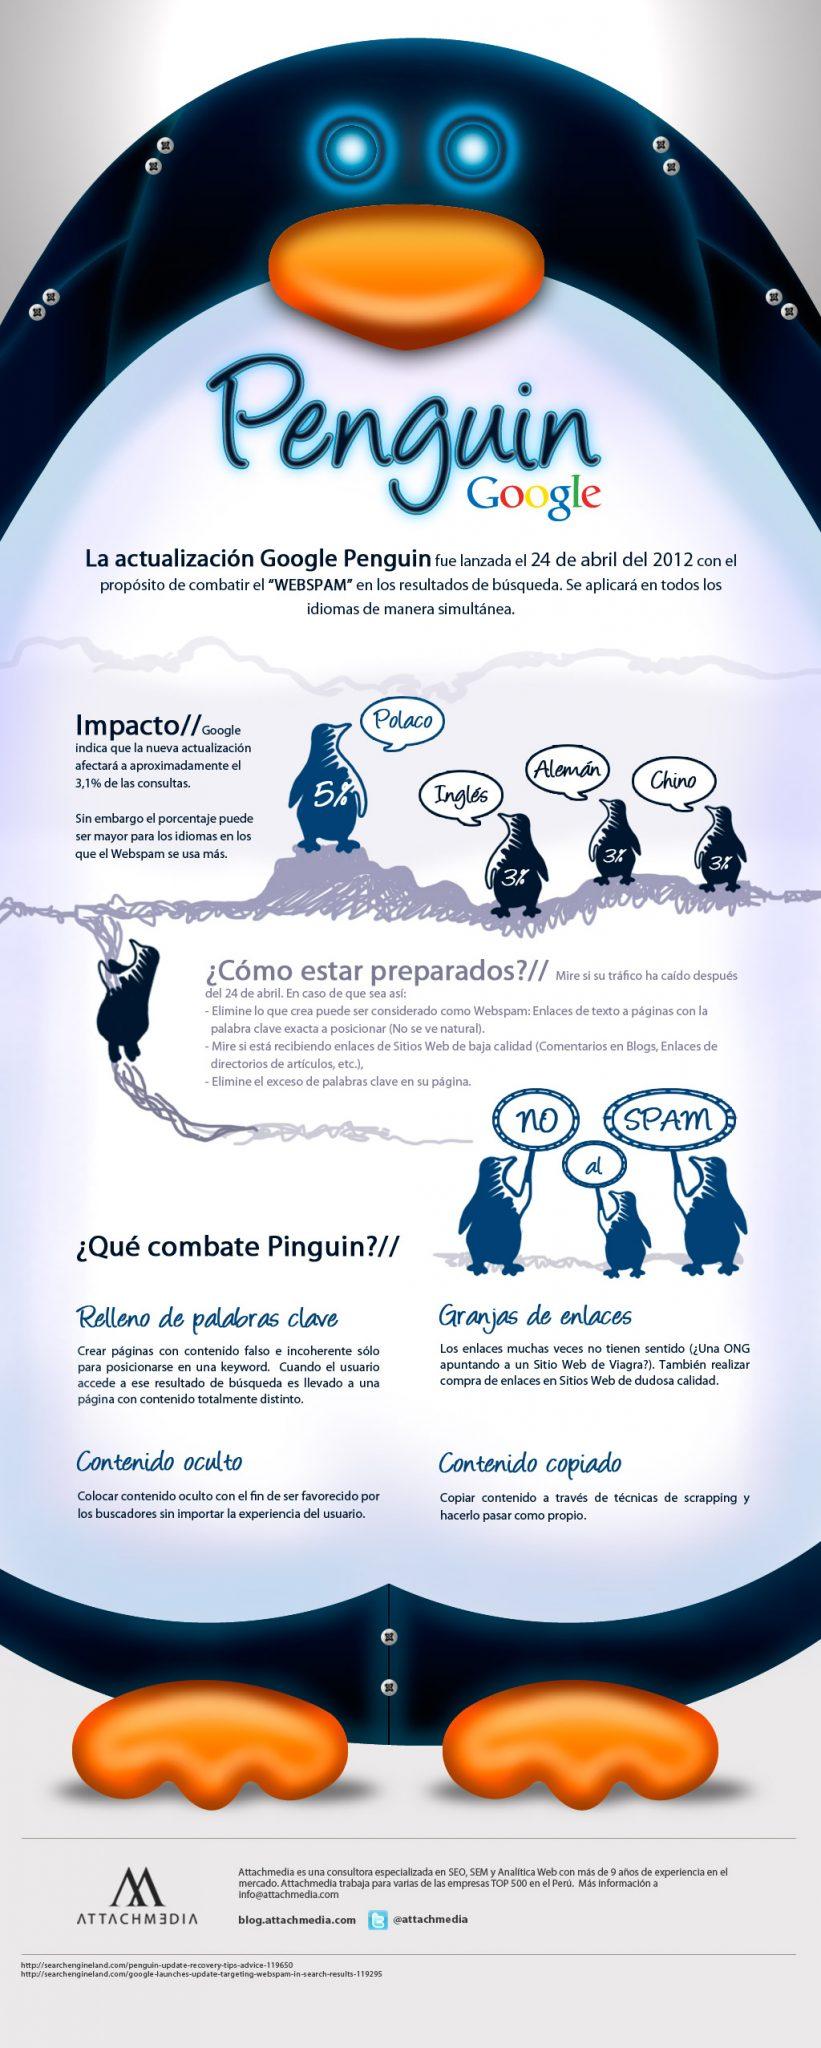 Google Penguin, Marketing de calidad #Vídeo #Infografía